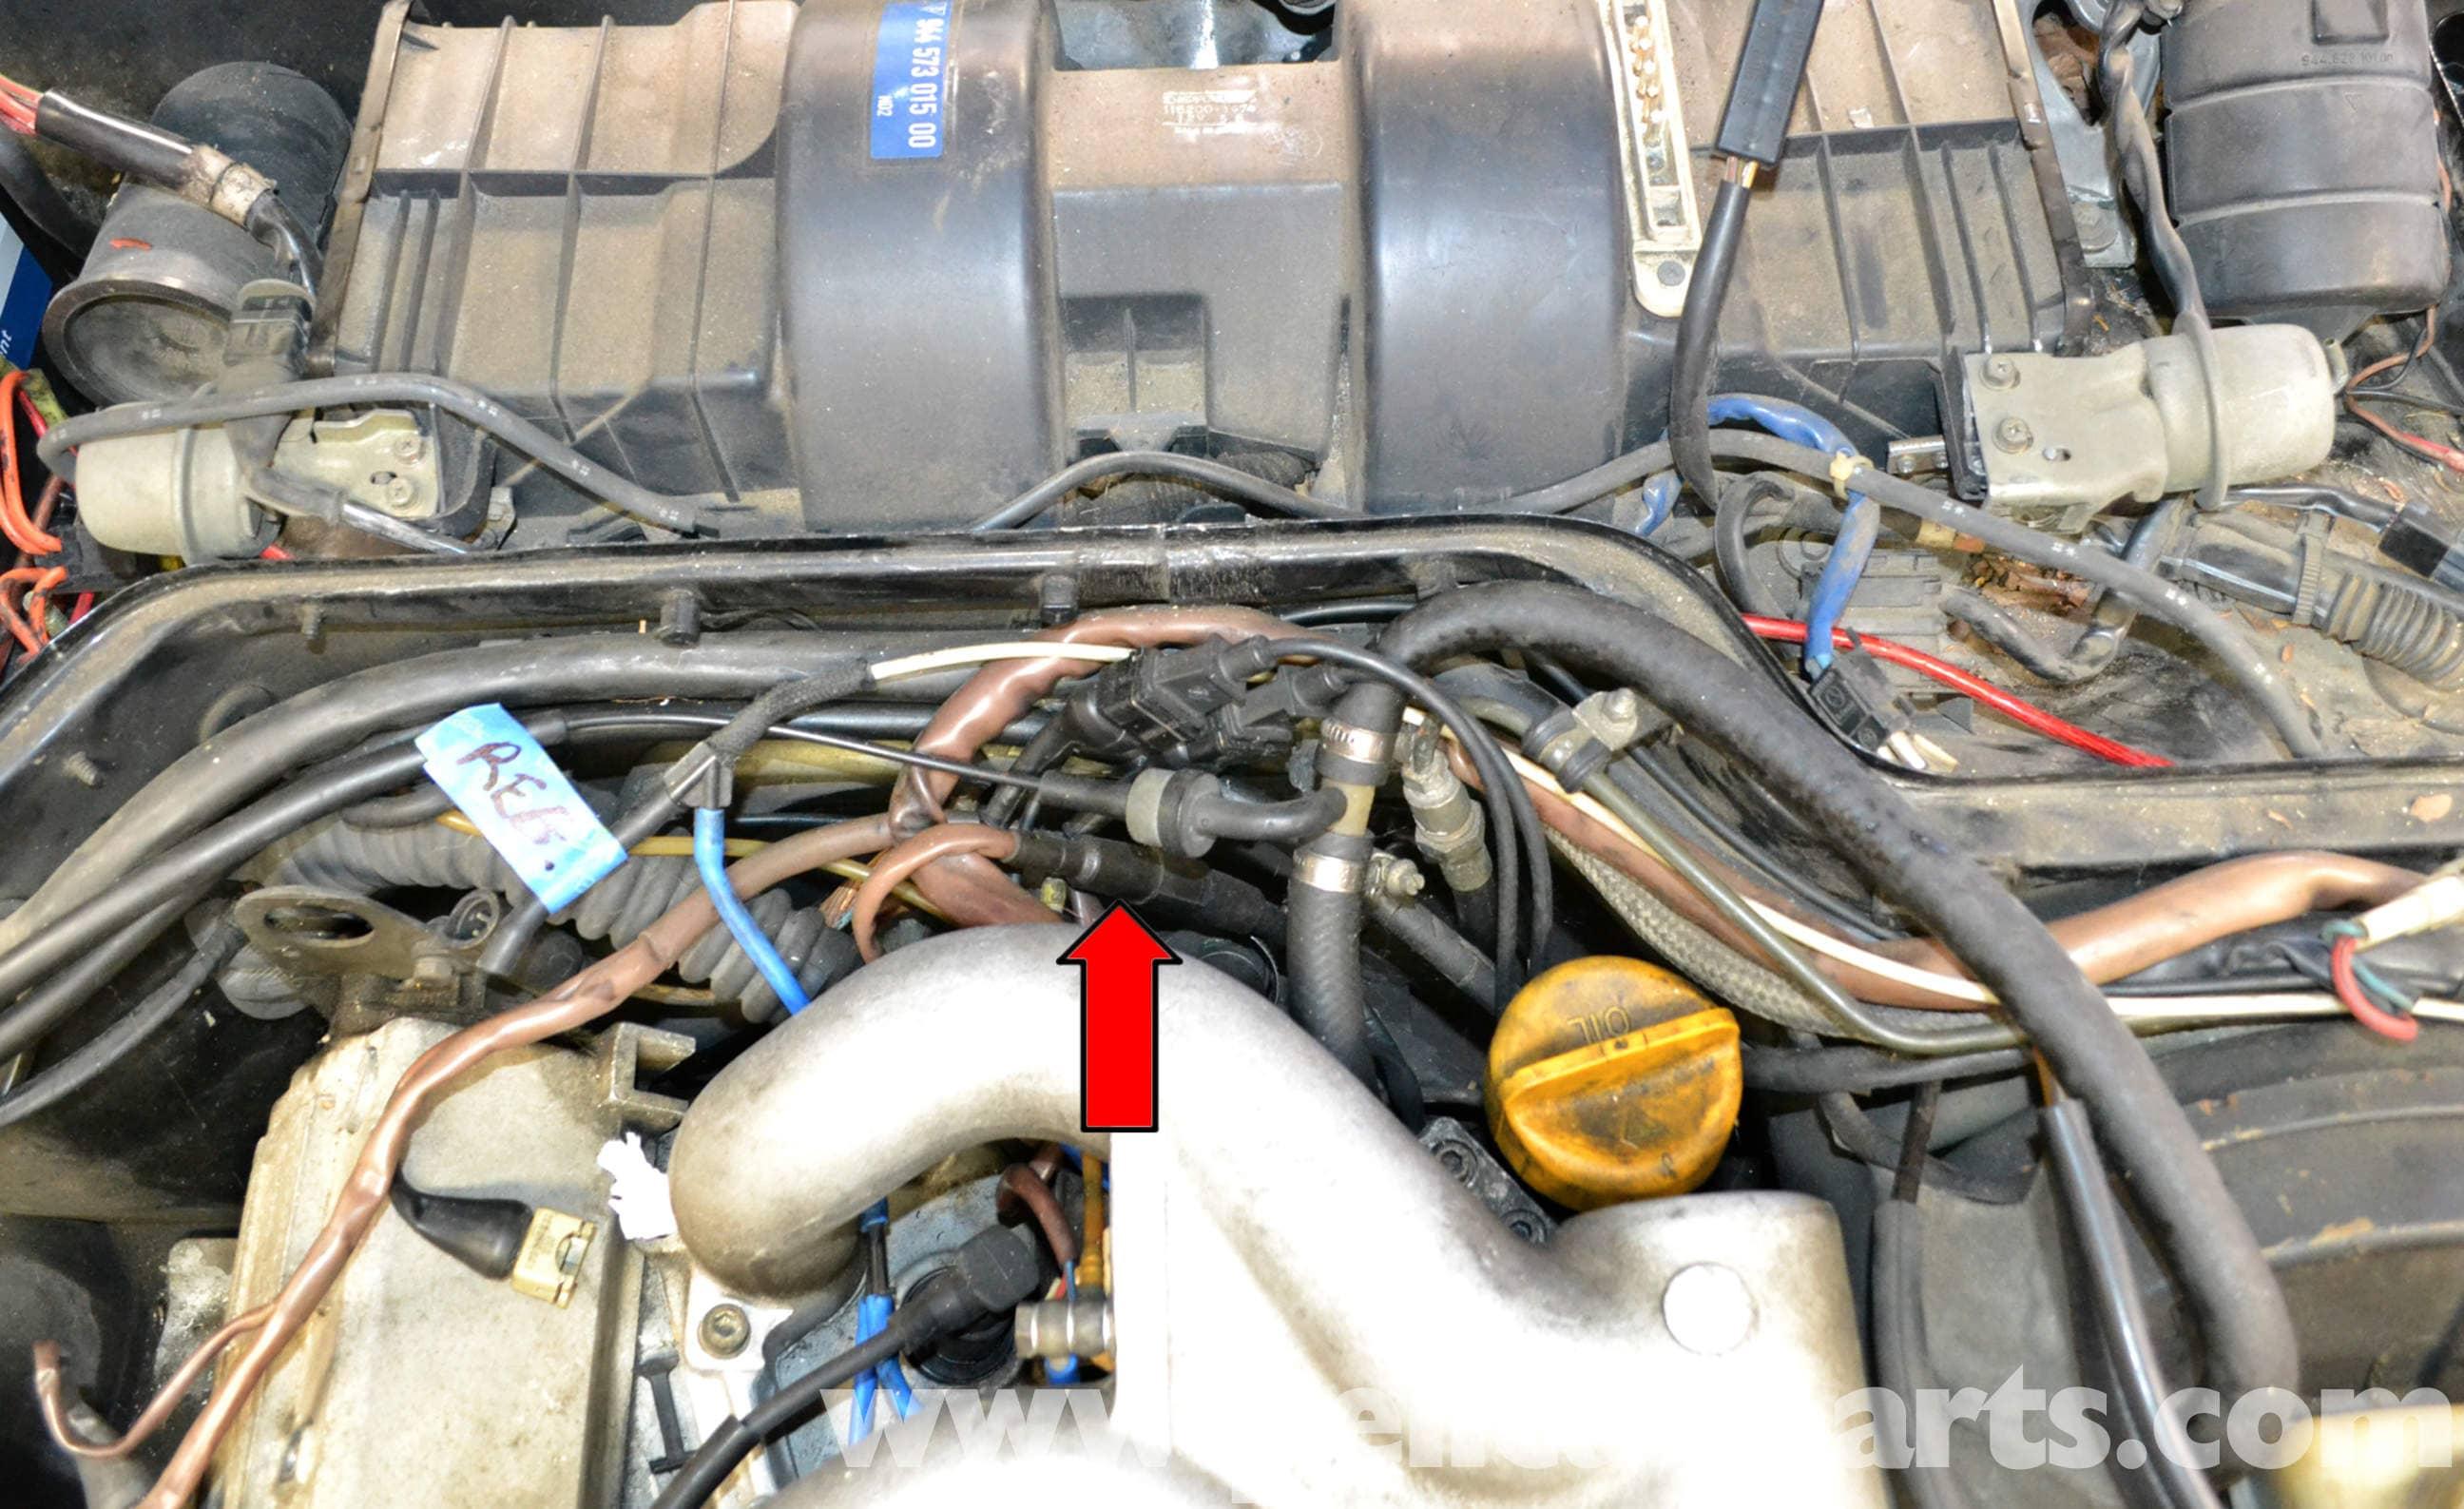 Wiring Money Safely Automotive Diagram Porsche 944 Turbo Oxygen Sensor Replacement 1986 1991 Wire Transfer